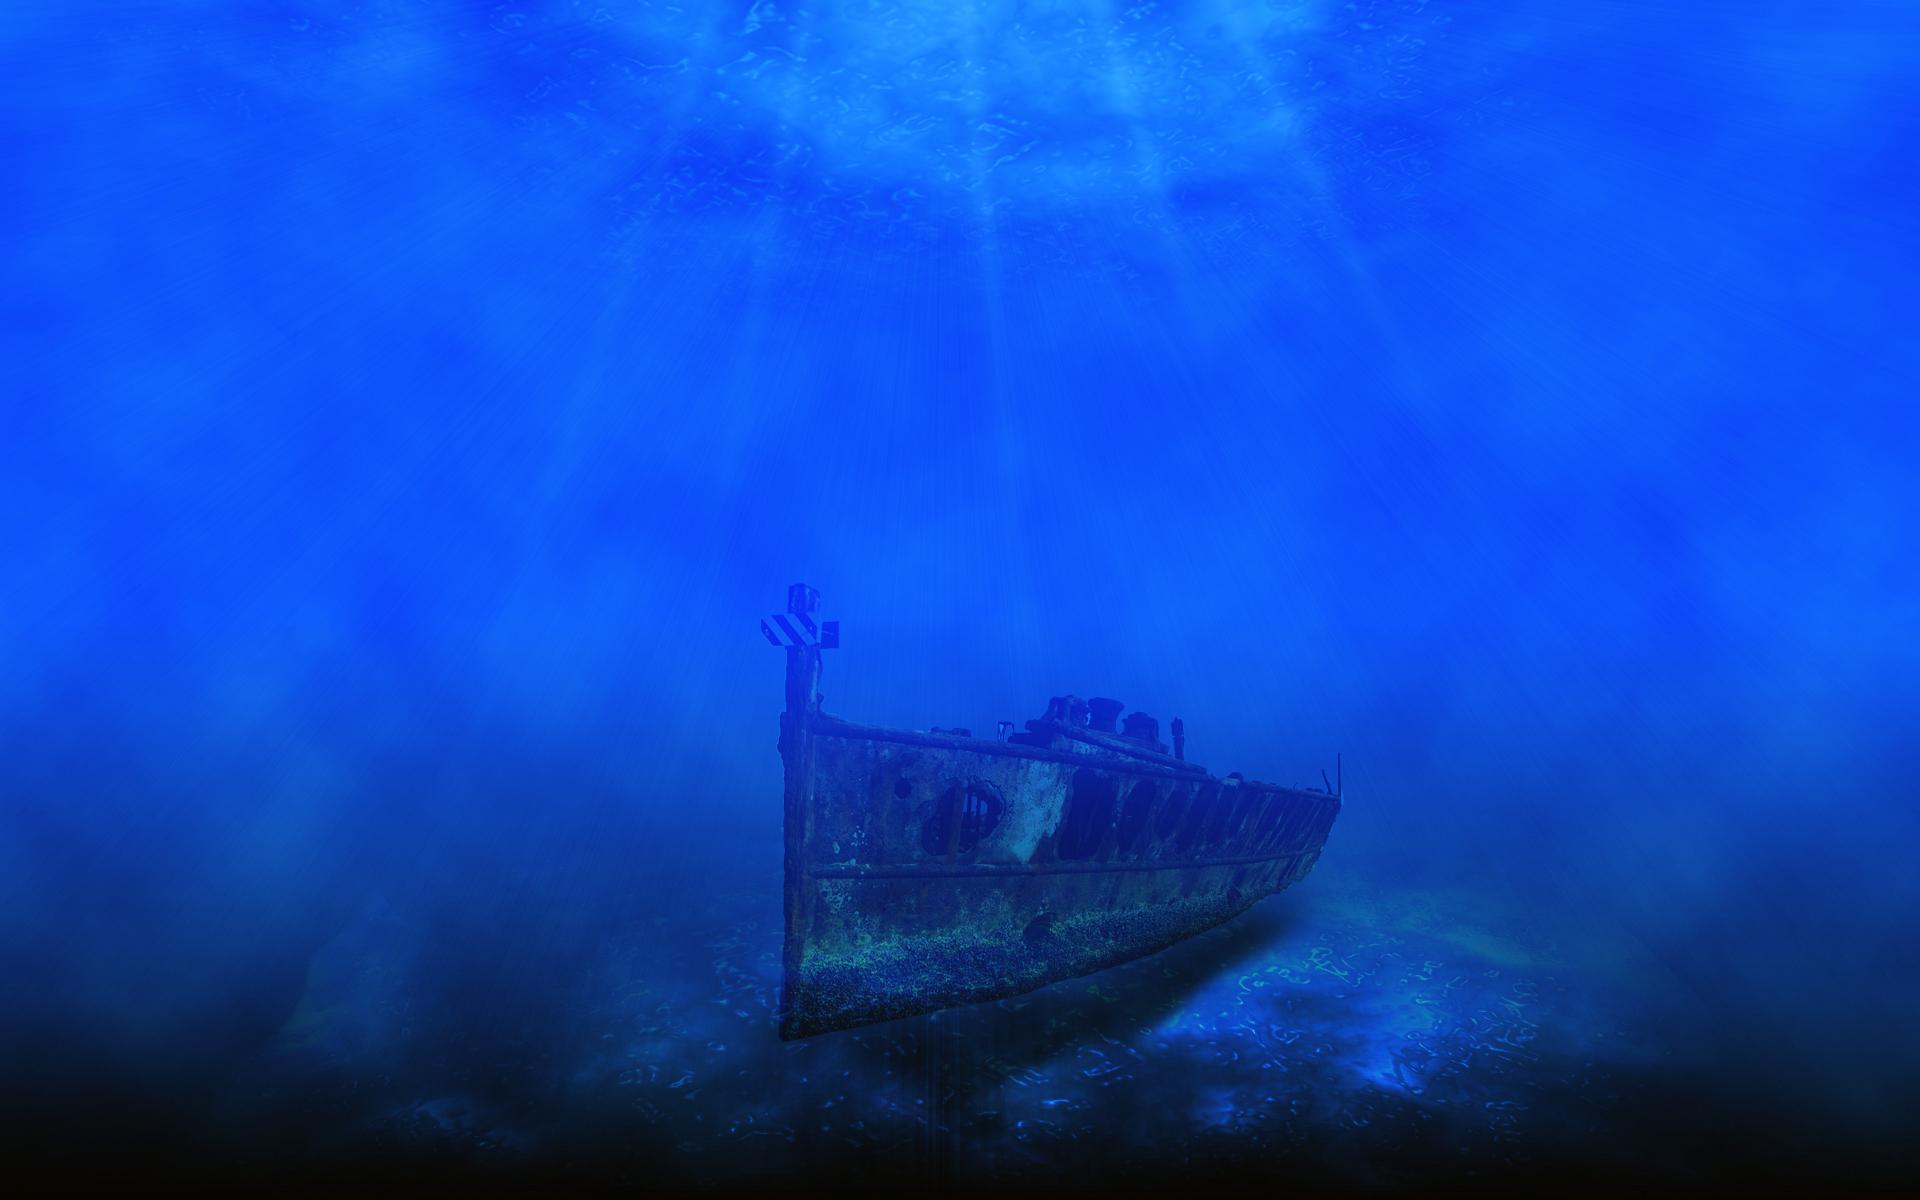 deep sea ocean backgrounds hd Car Tuning 1920x1200